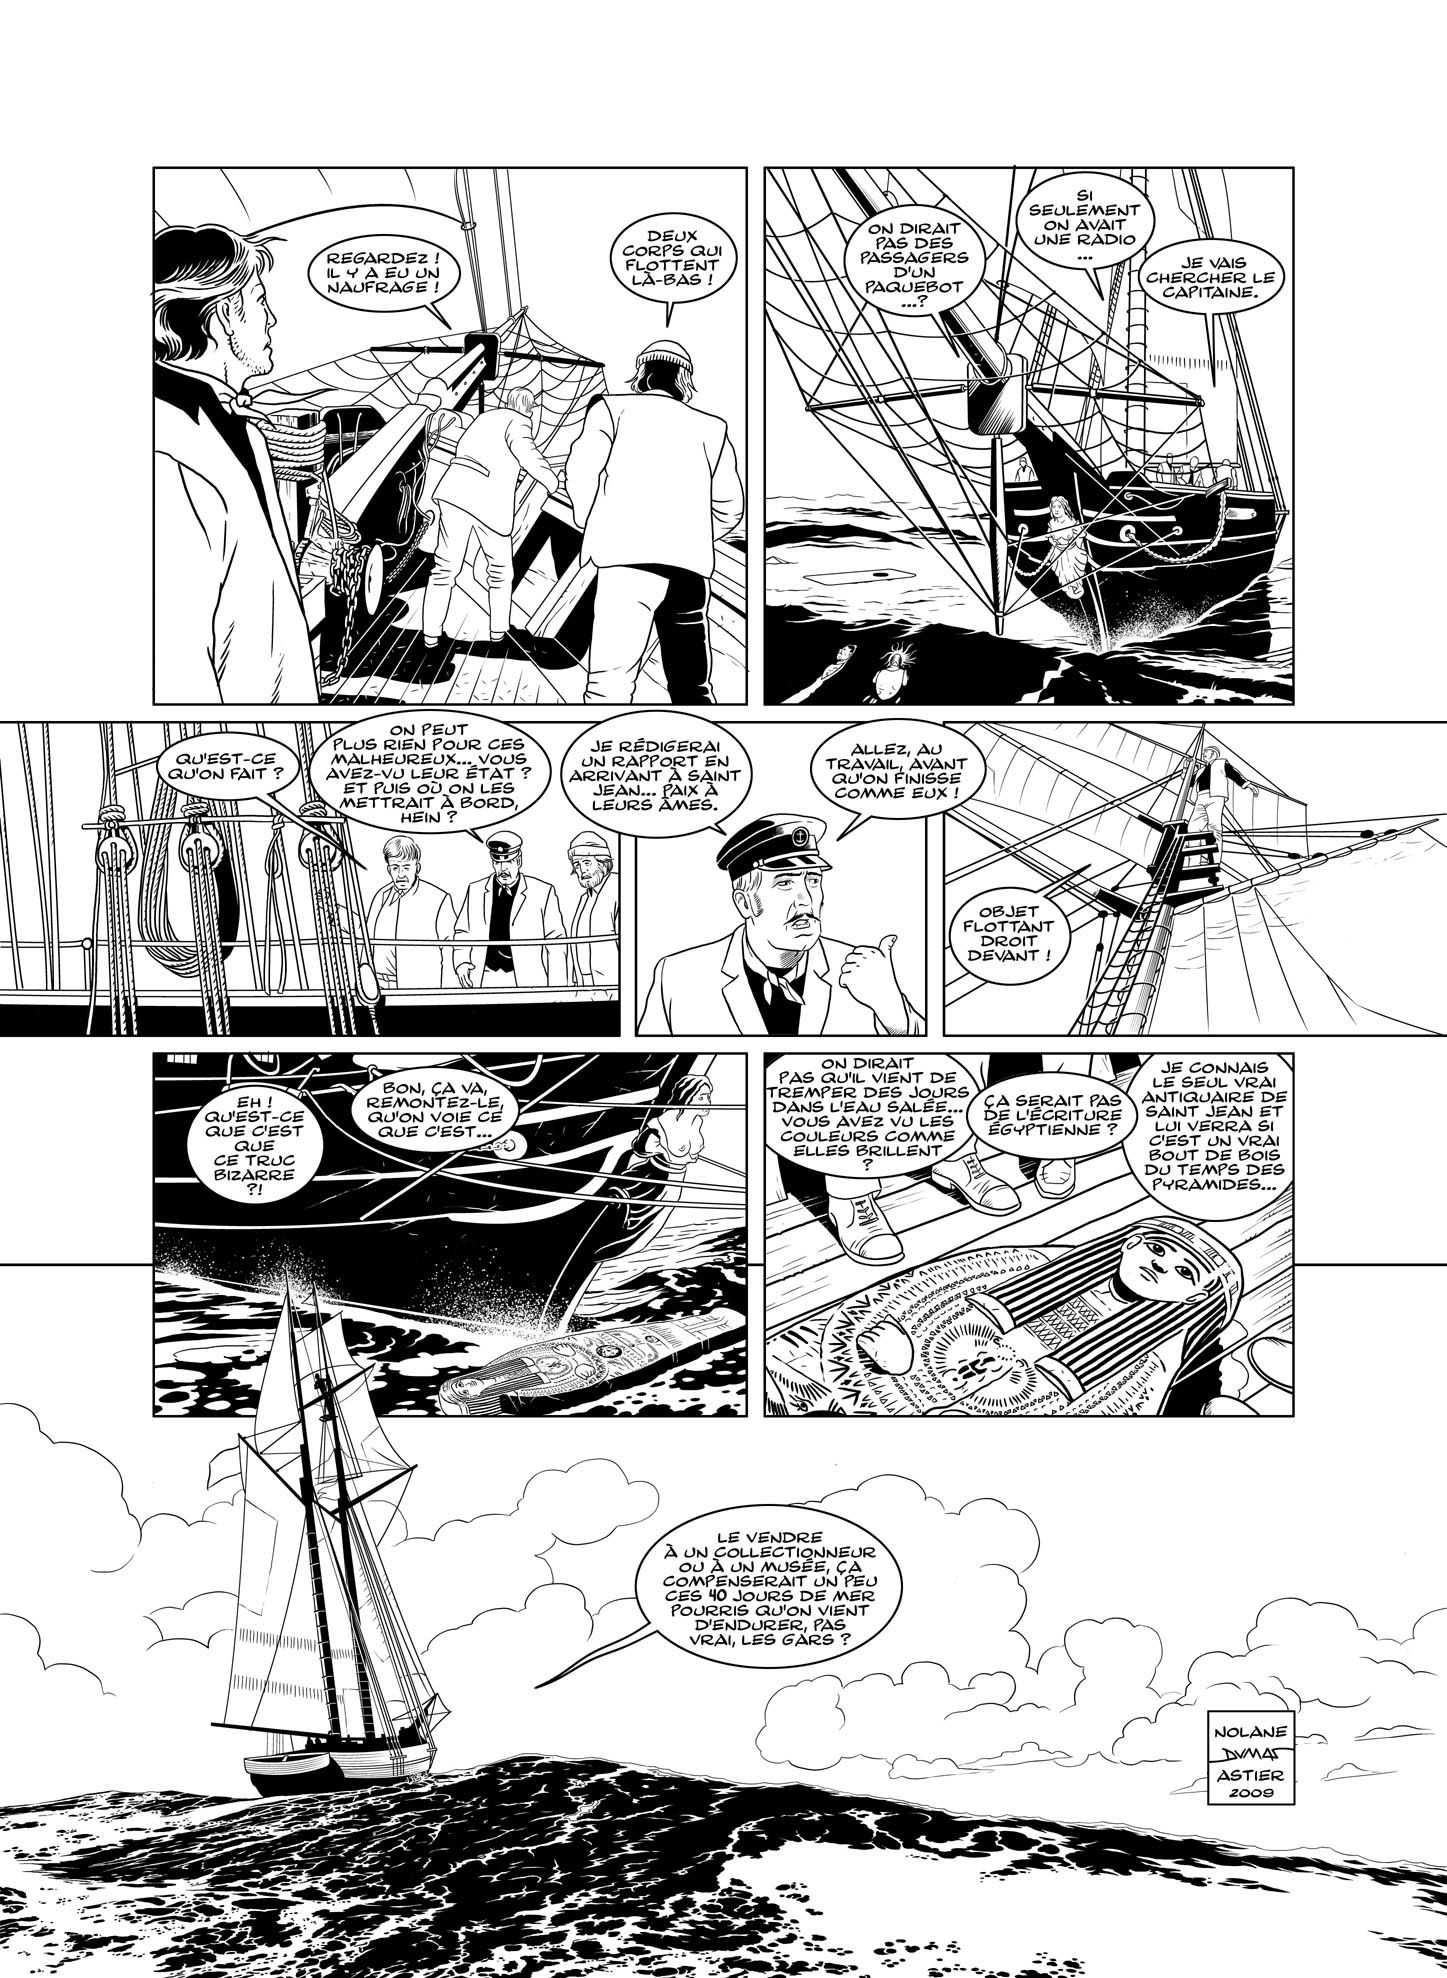 titanic scnario richard d nolane dessin patrick a dumas - Dessin Titanic